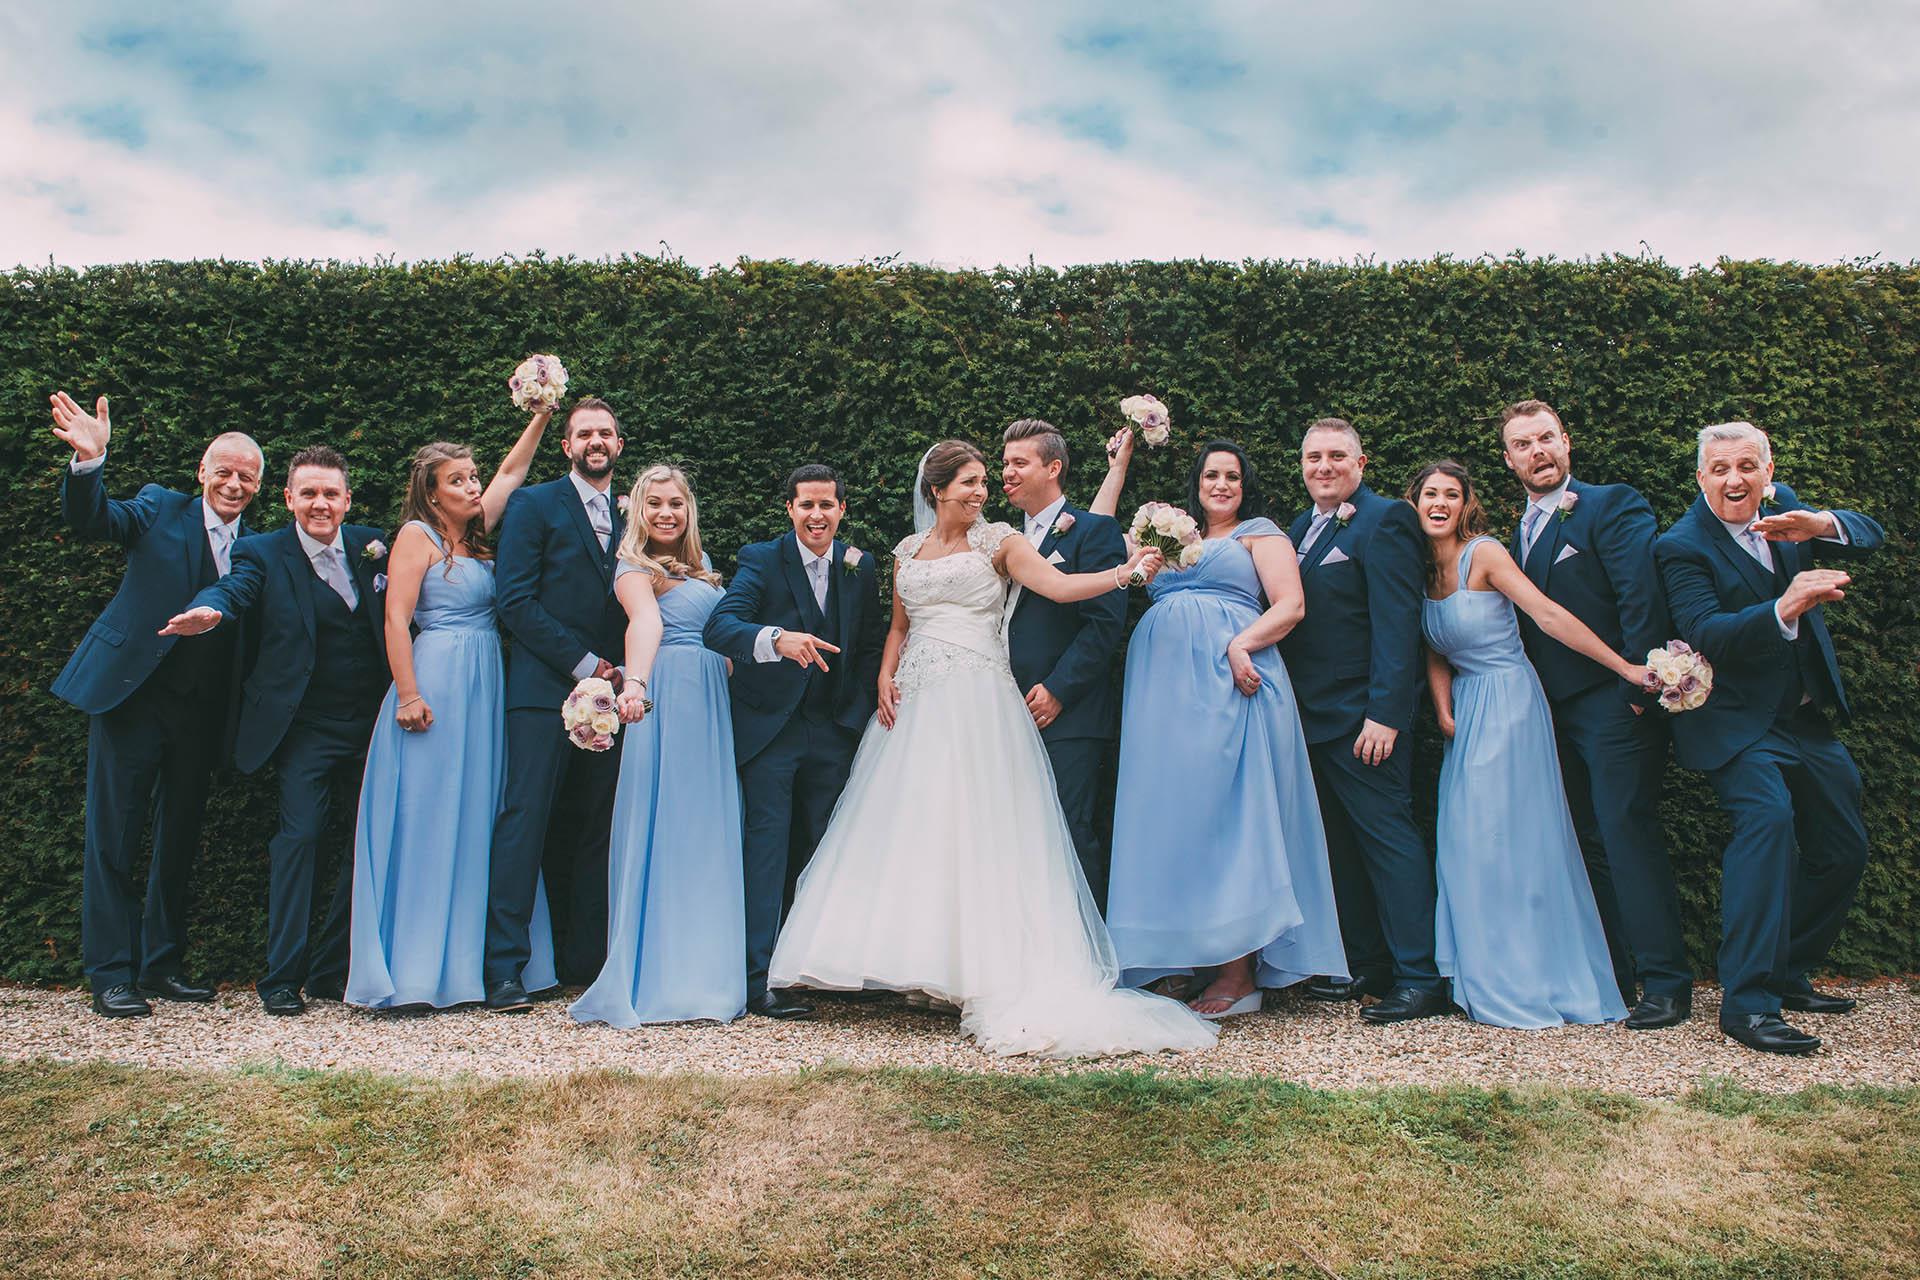 laura-wedding